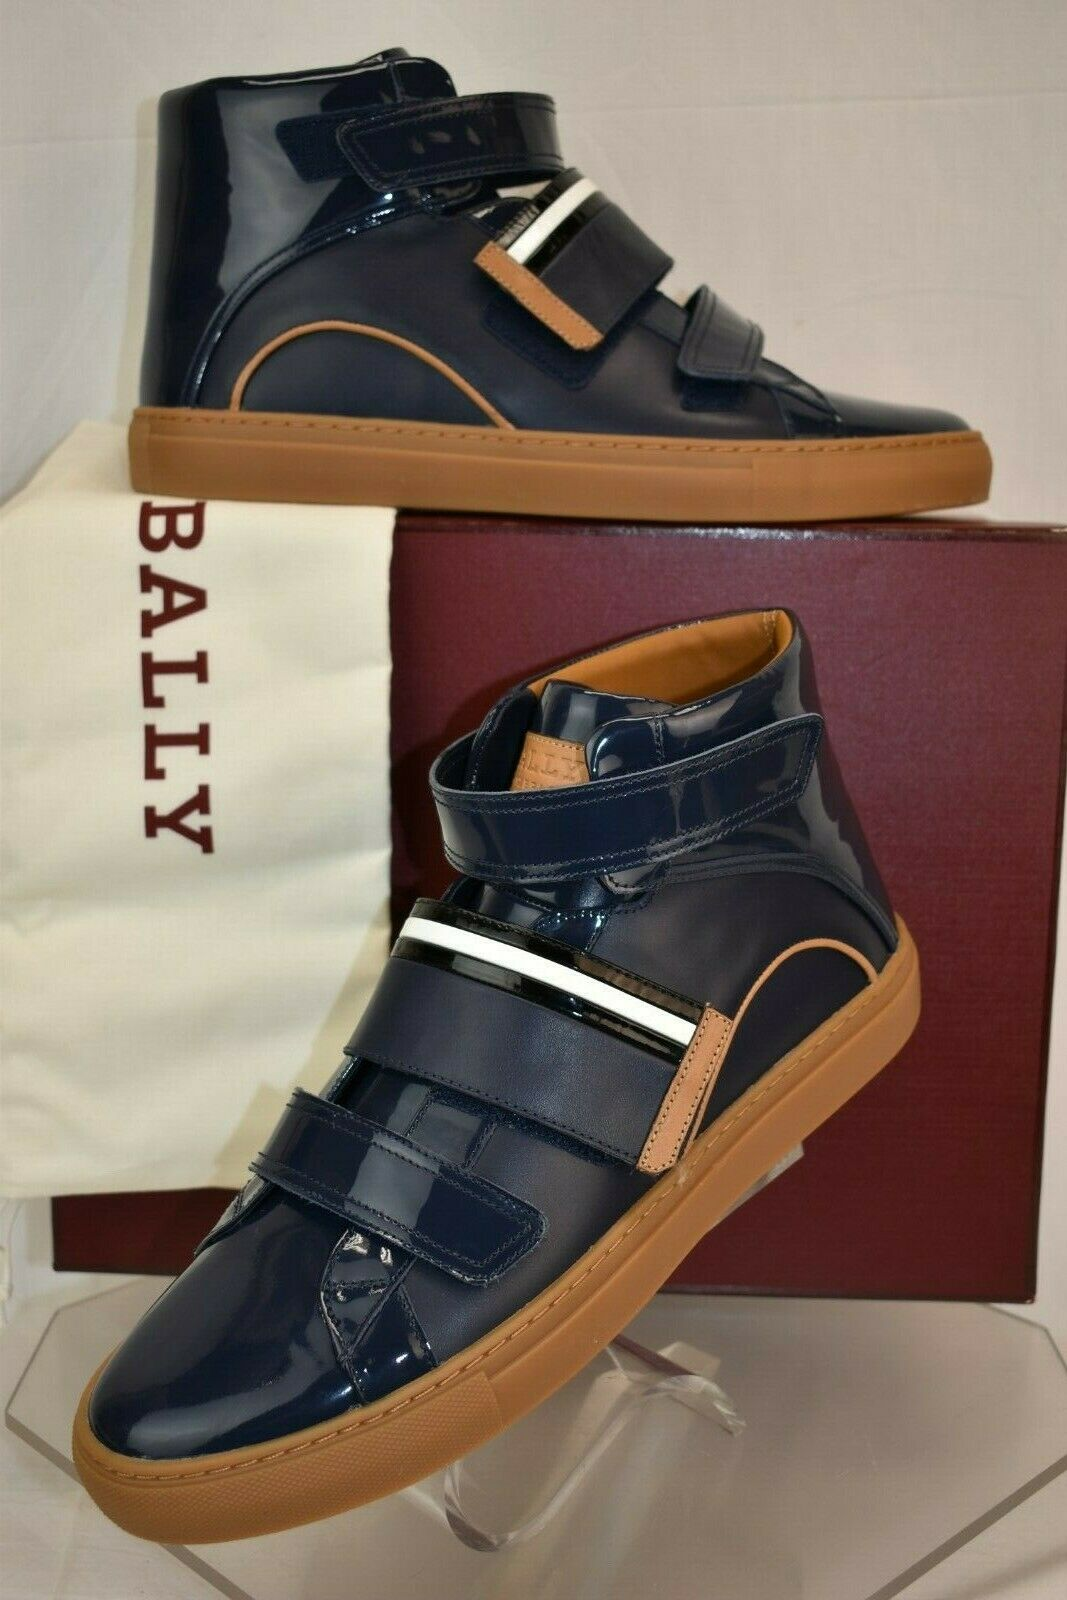 BALLY HERICK INK blu PATENT LEATHER HI TOP STRIPE LOGO scarpe da ginnastica 10 US 43